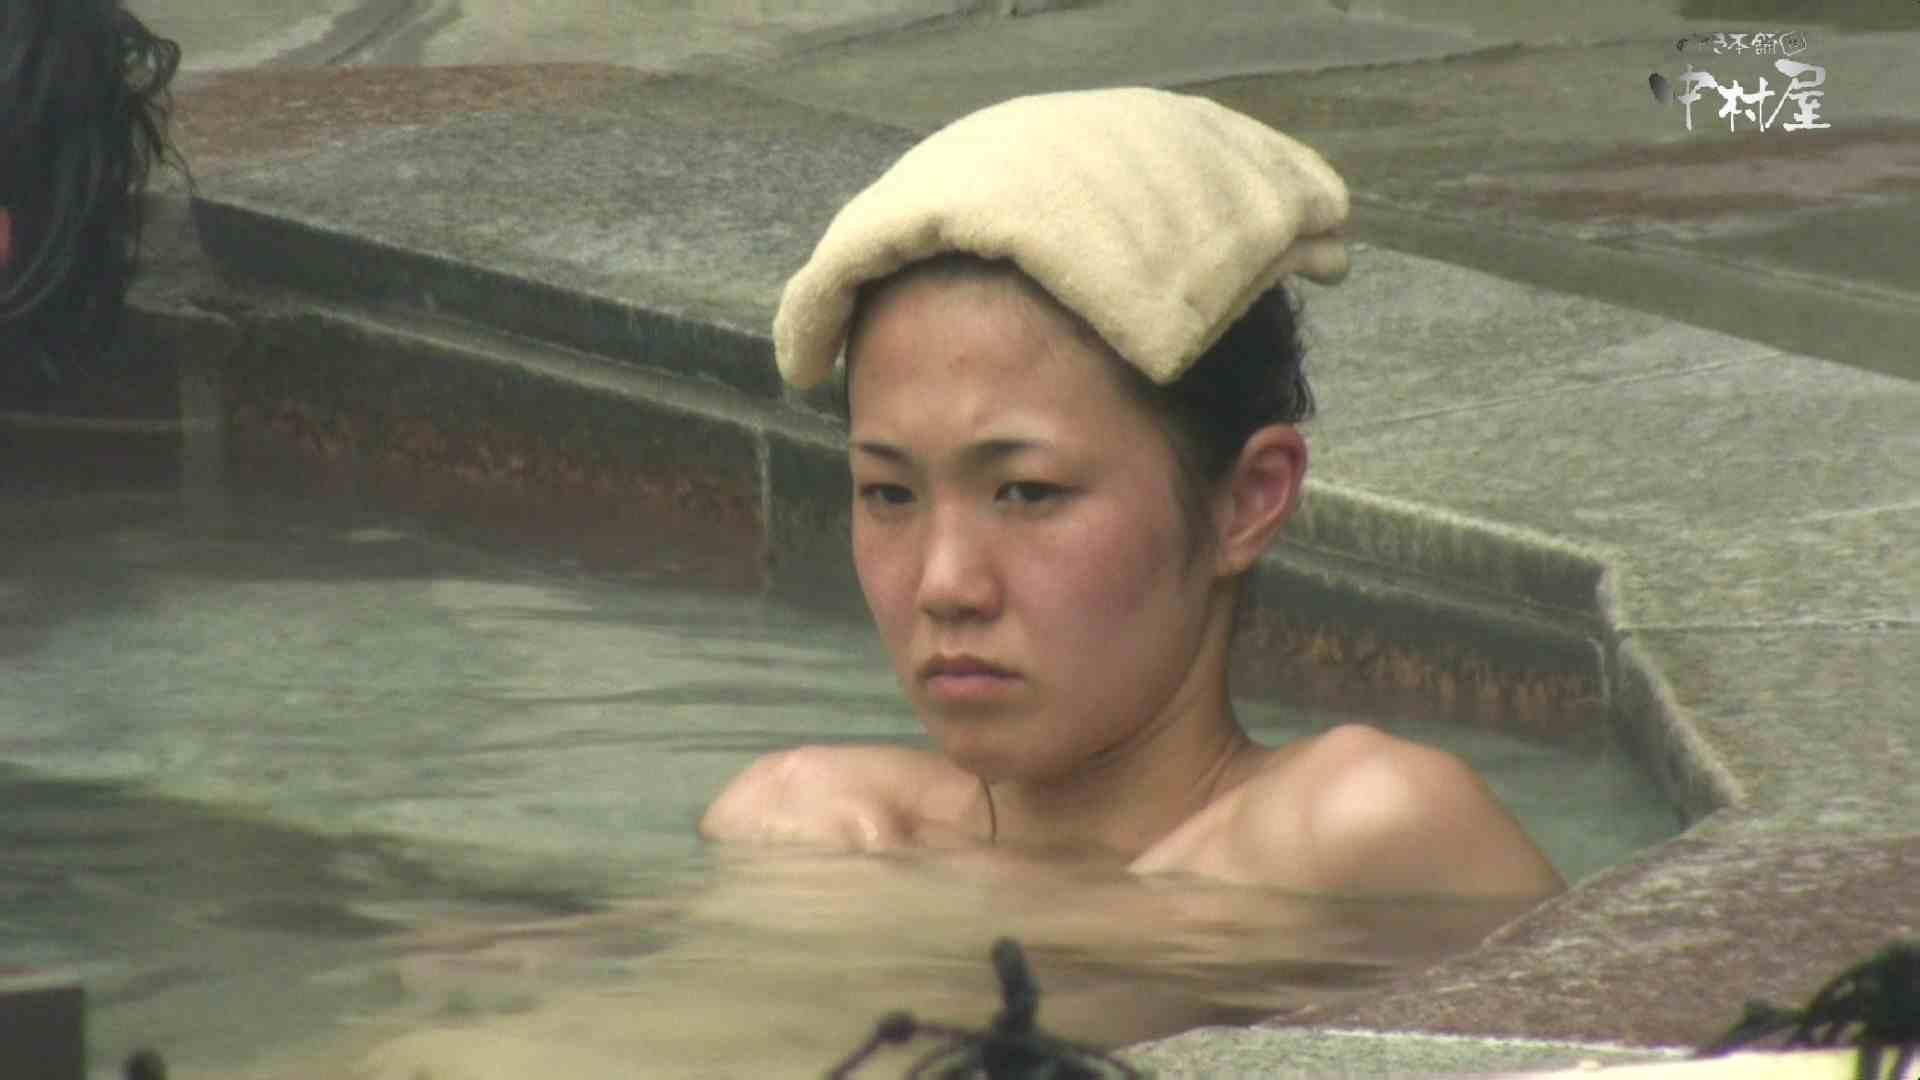 Aquaな露天風呂Vol.889 0  87連発 72